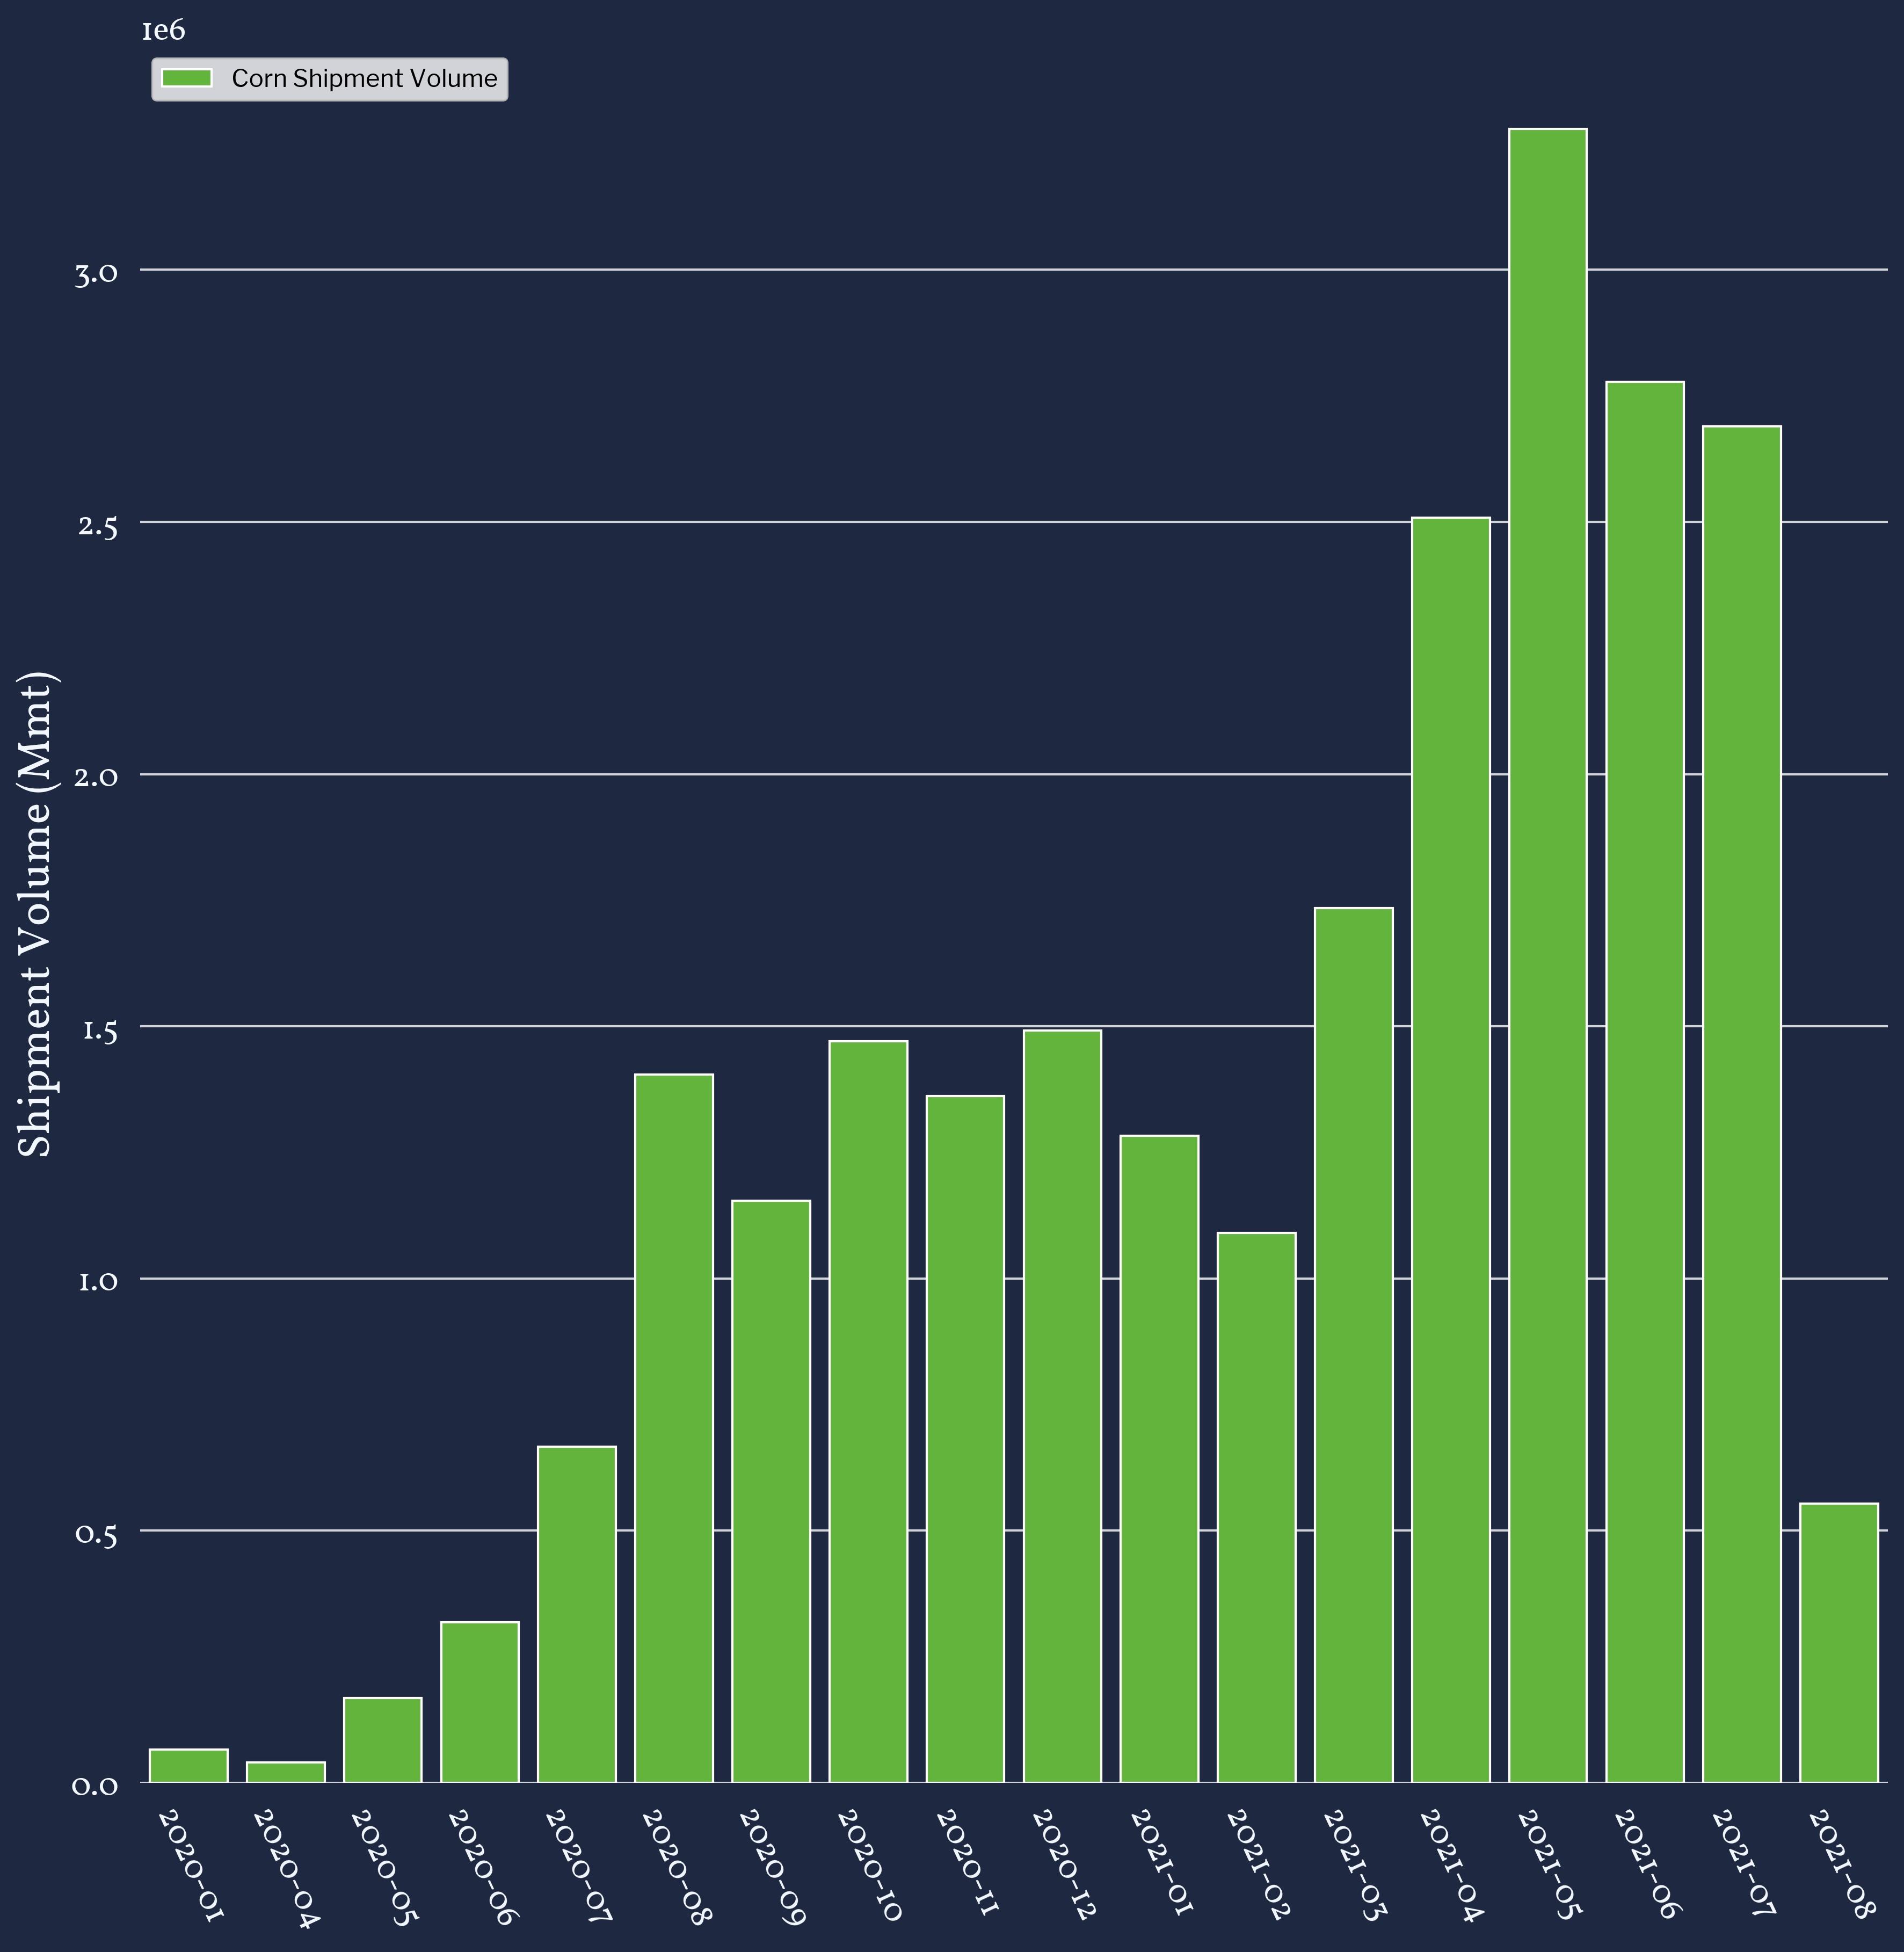 China Corn Import Volumes